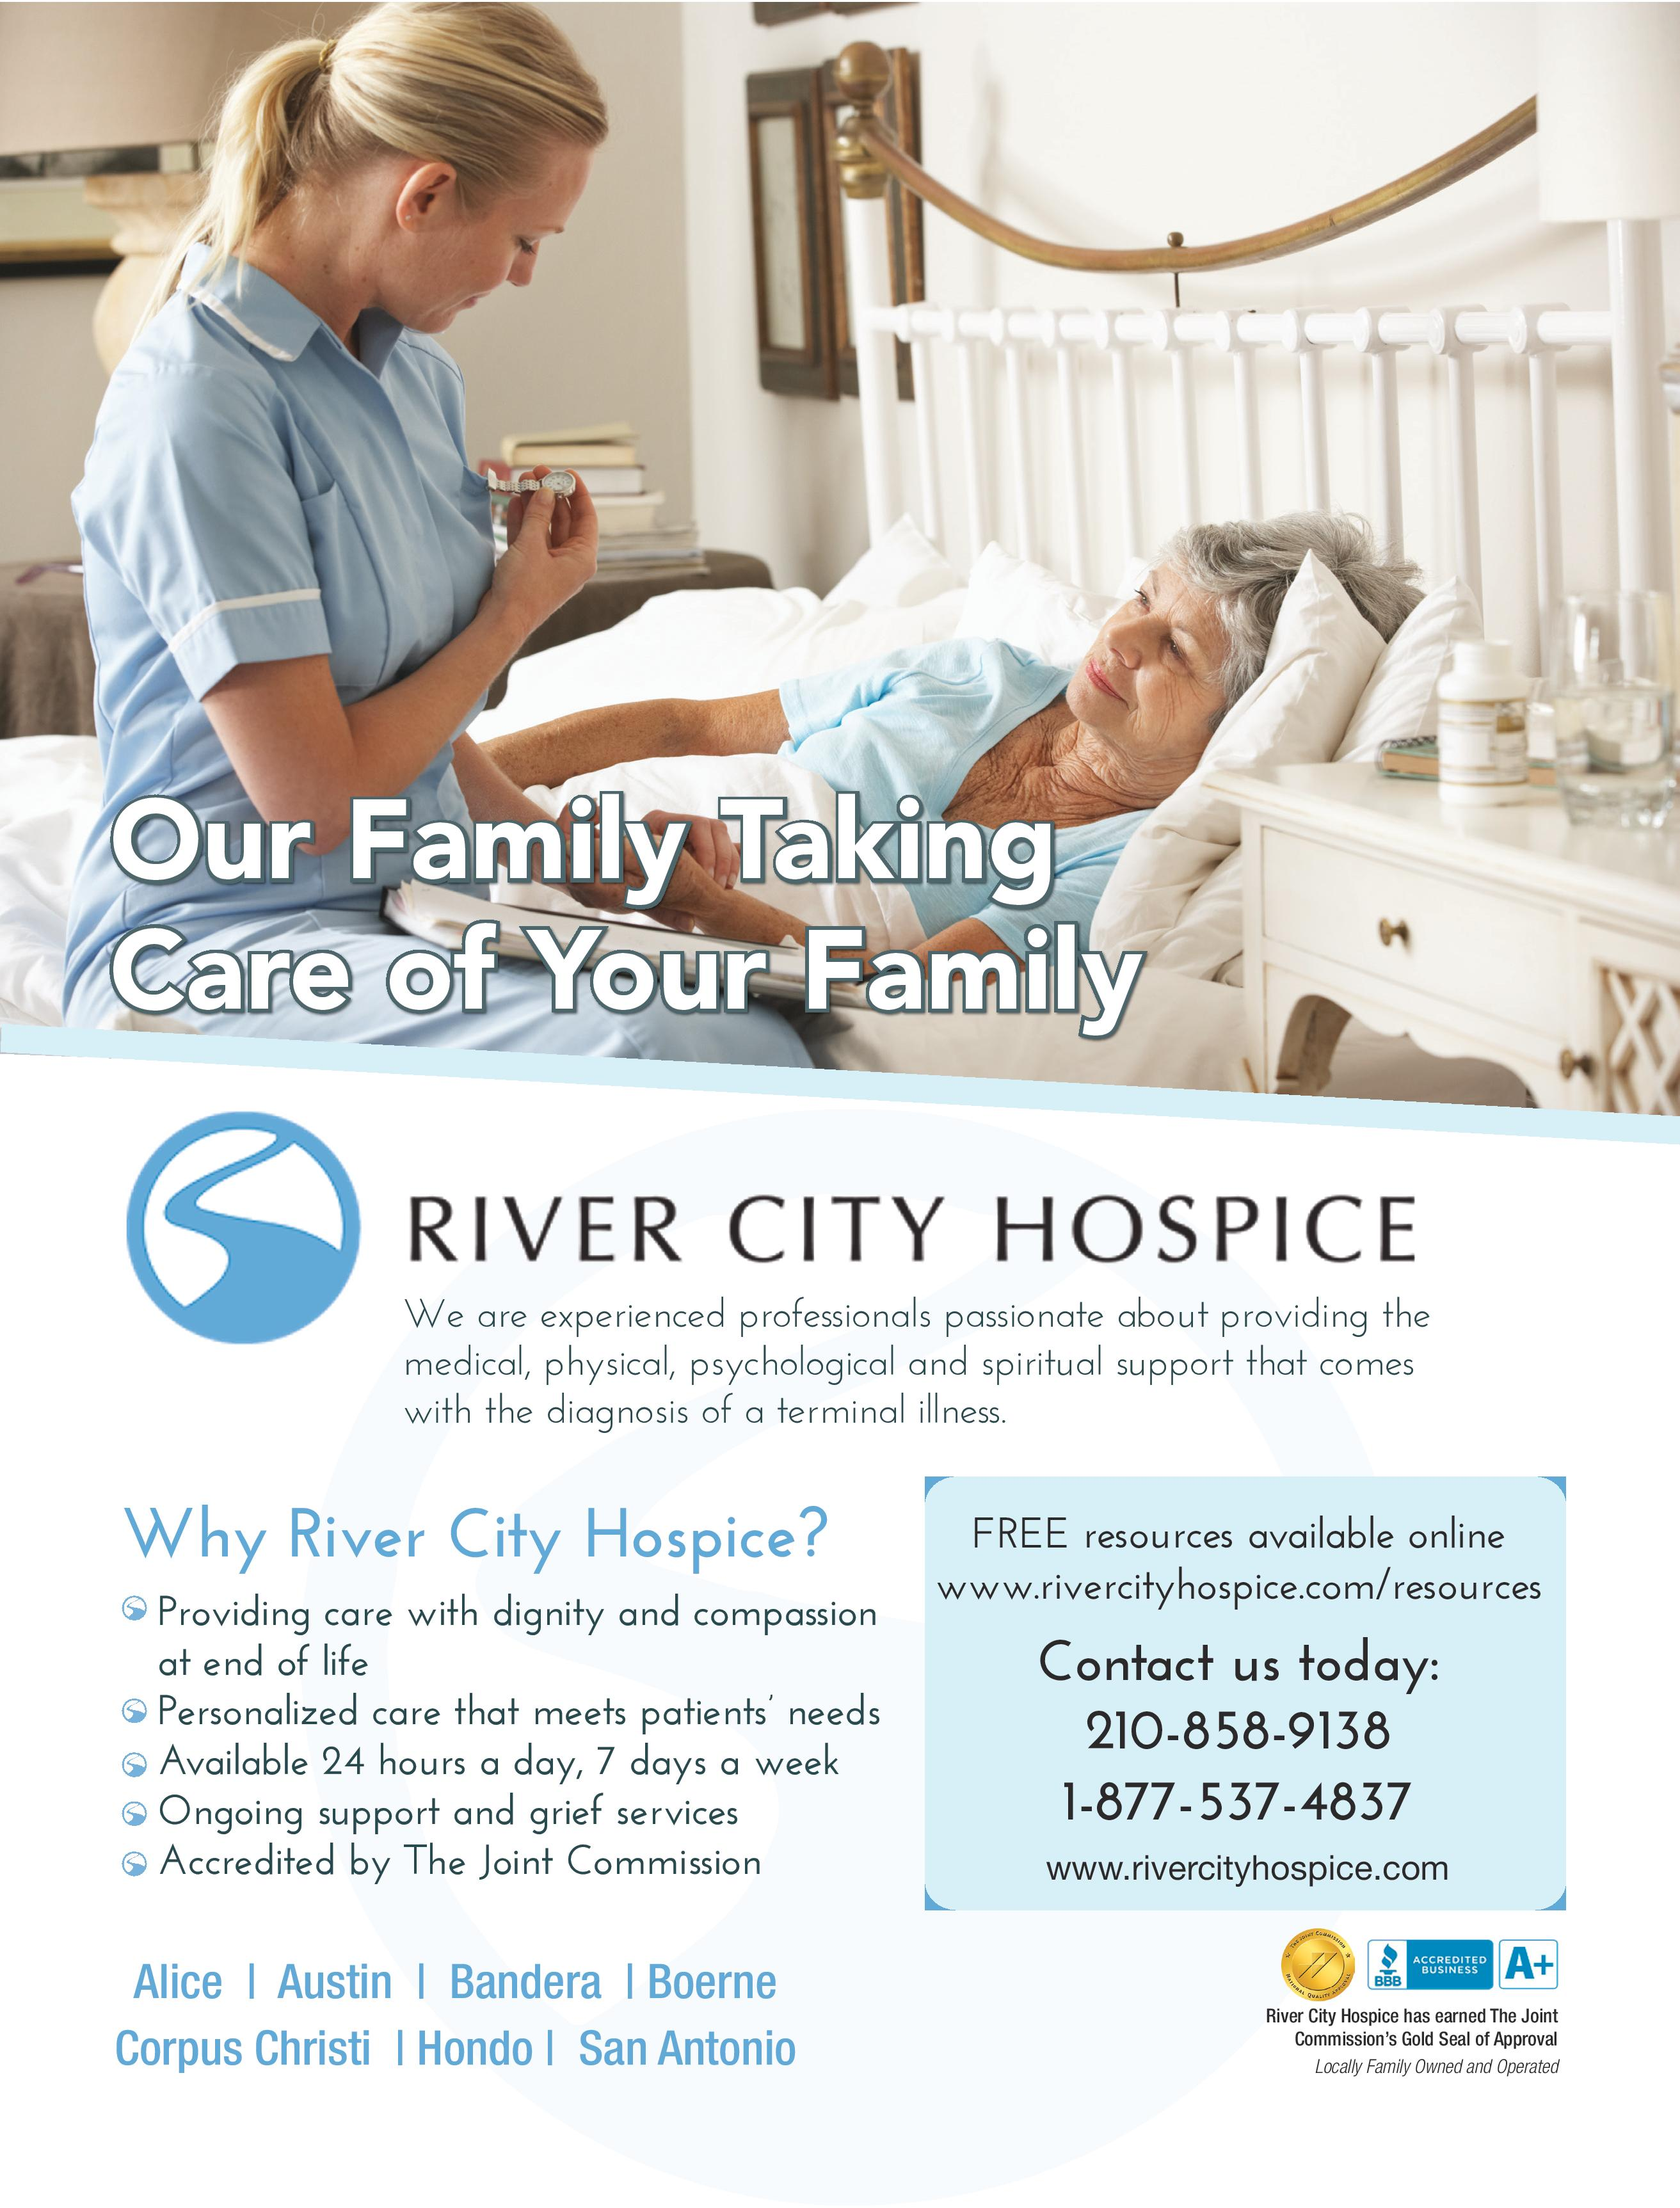 river_city_hospice_full_standard_nov_2017_v.final-page-001